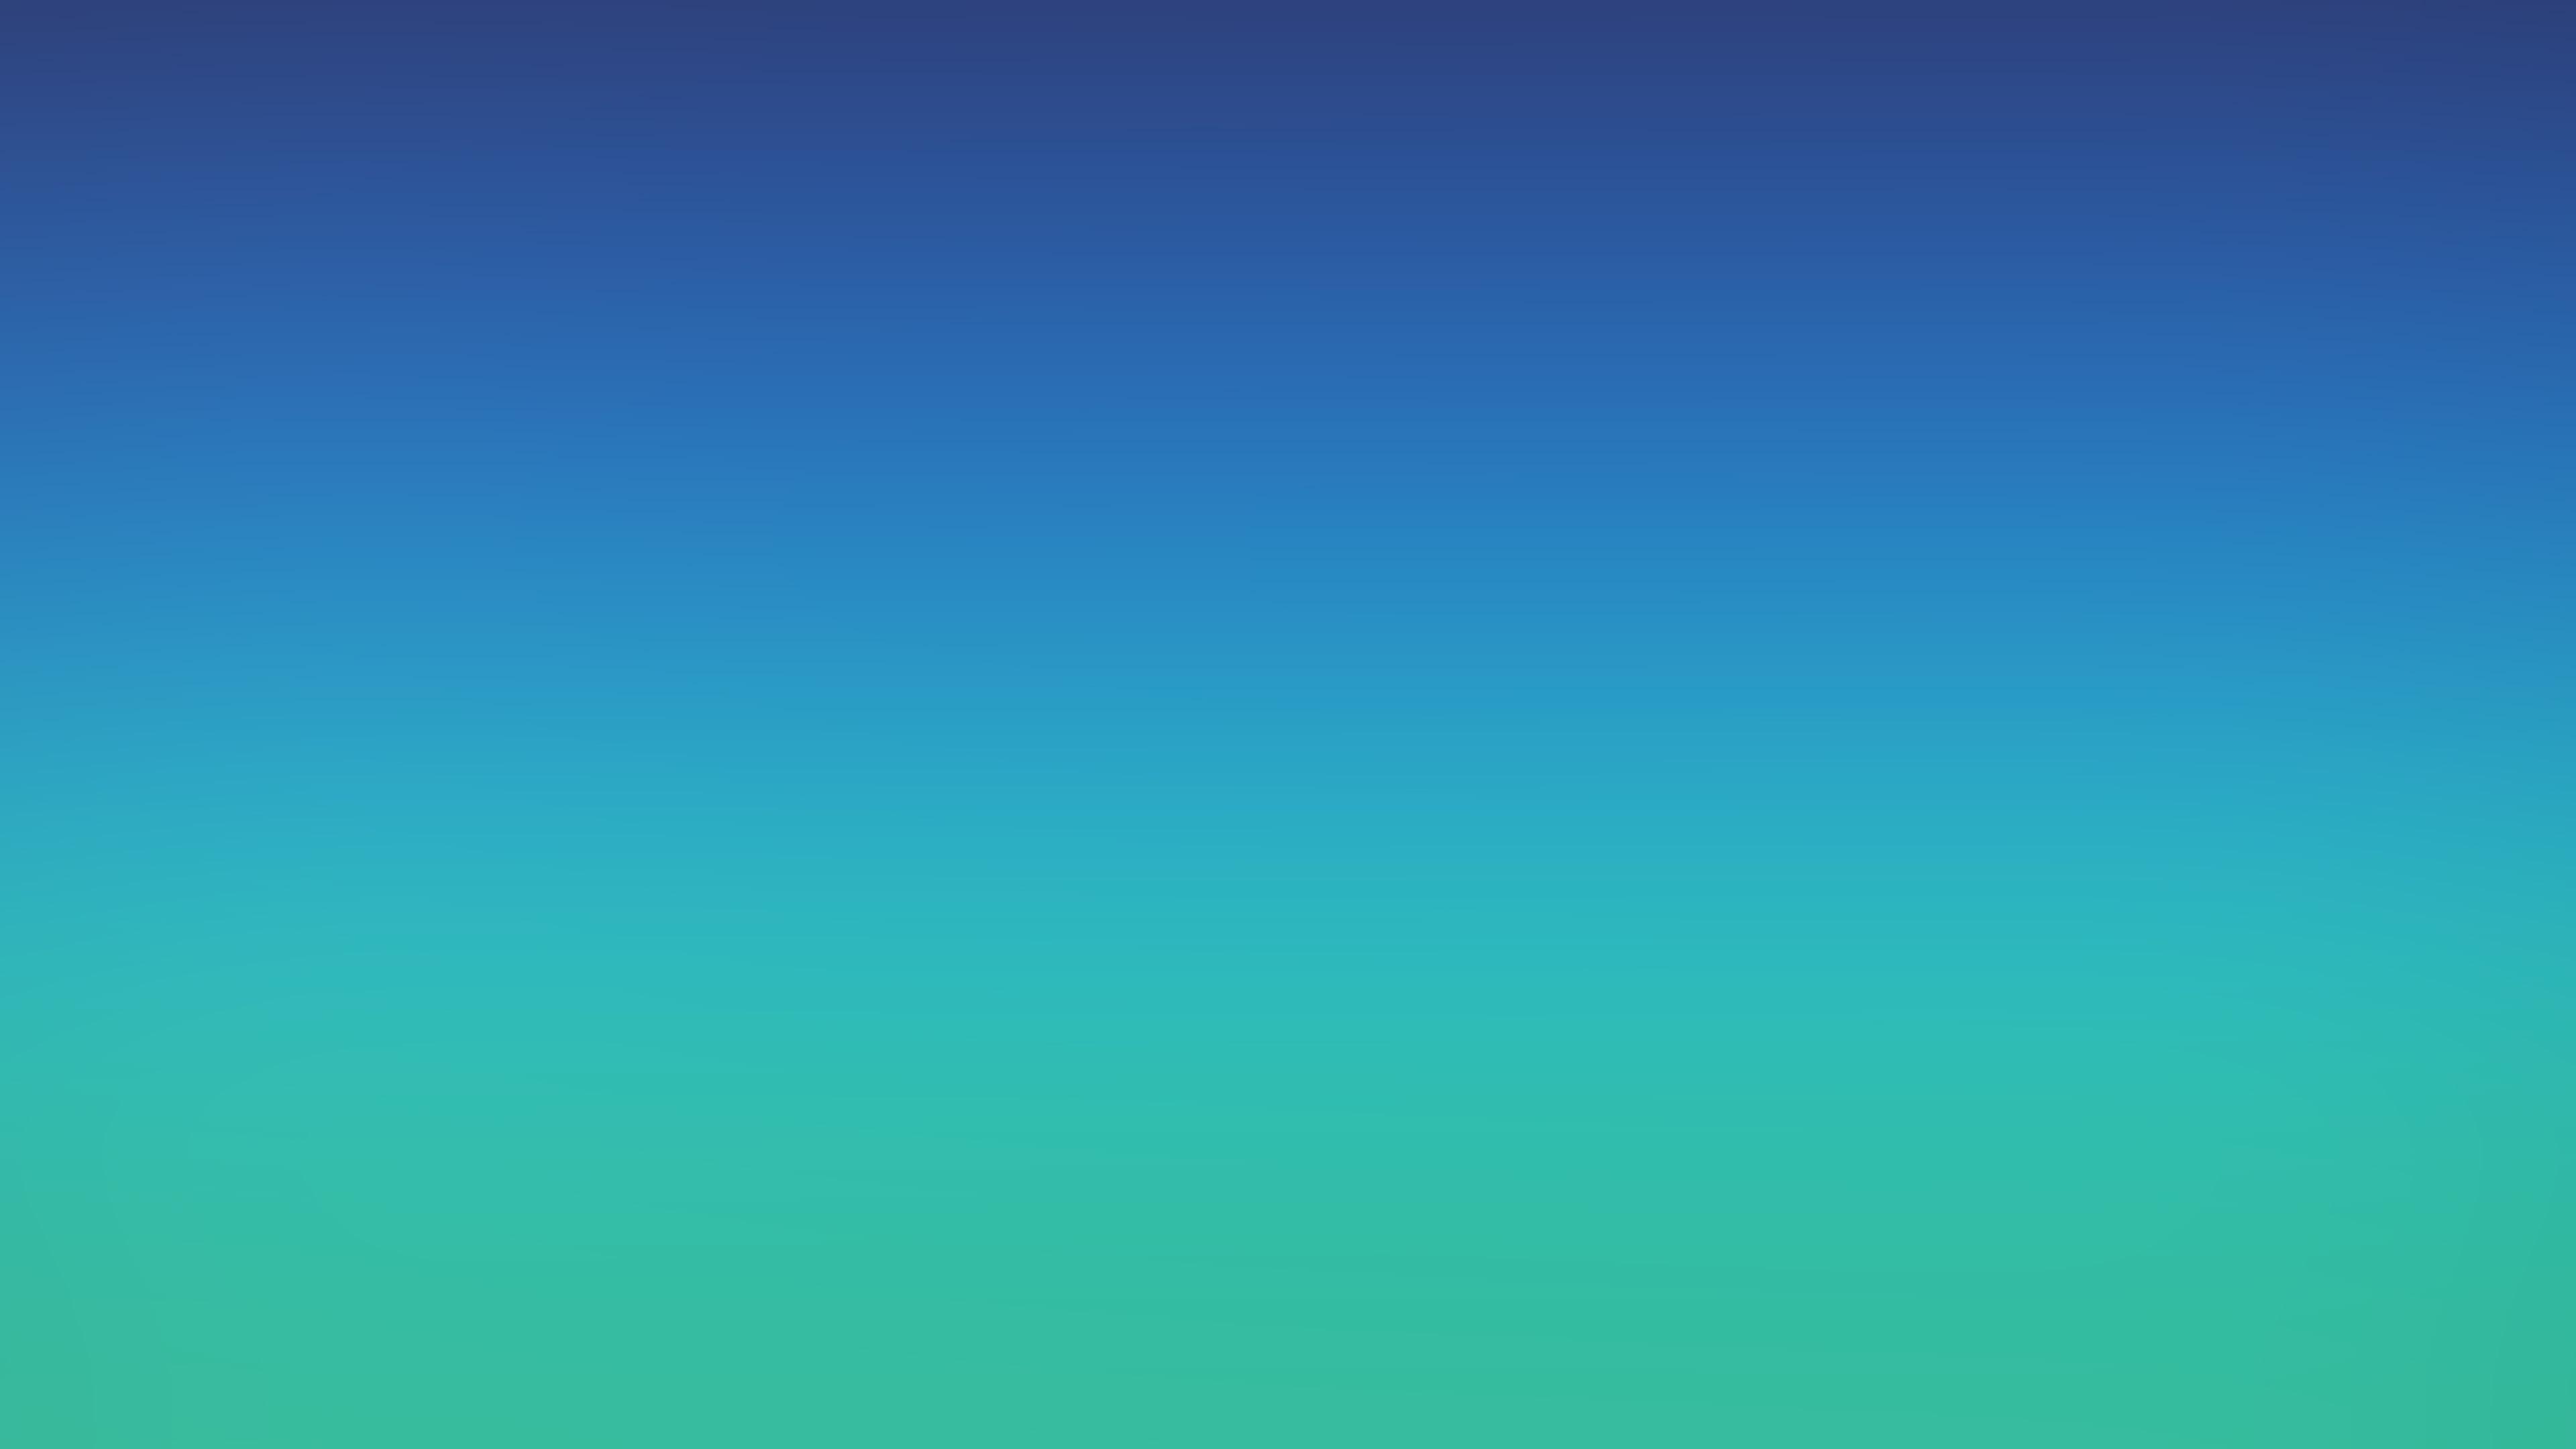 wallpaper for desktop, laptop | sh36-nintendo-green-blue ...